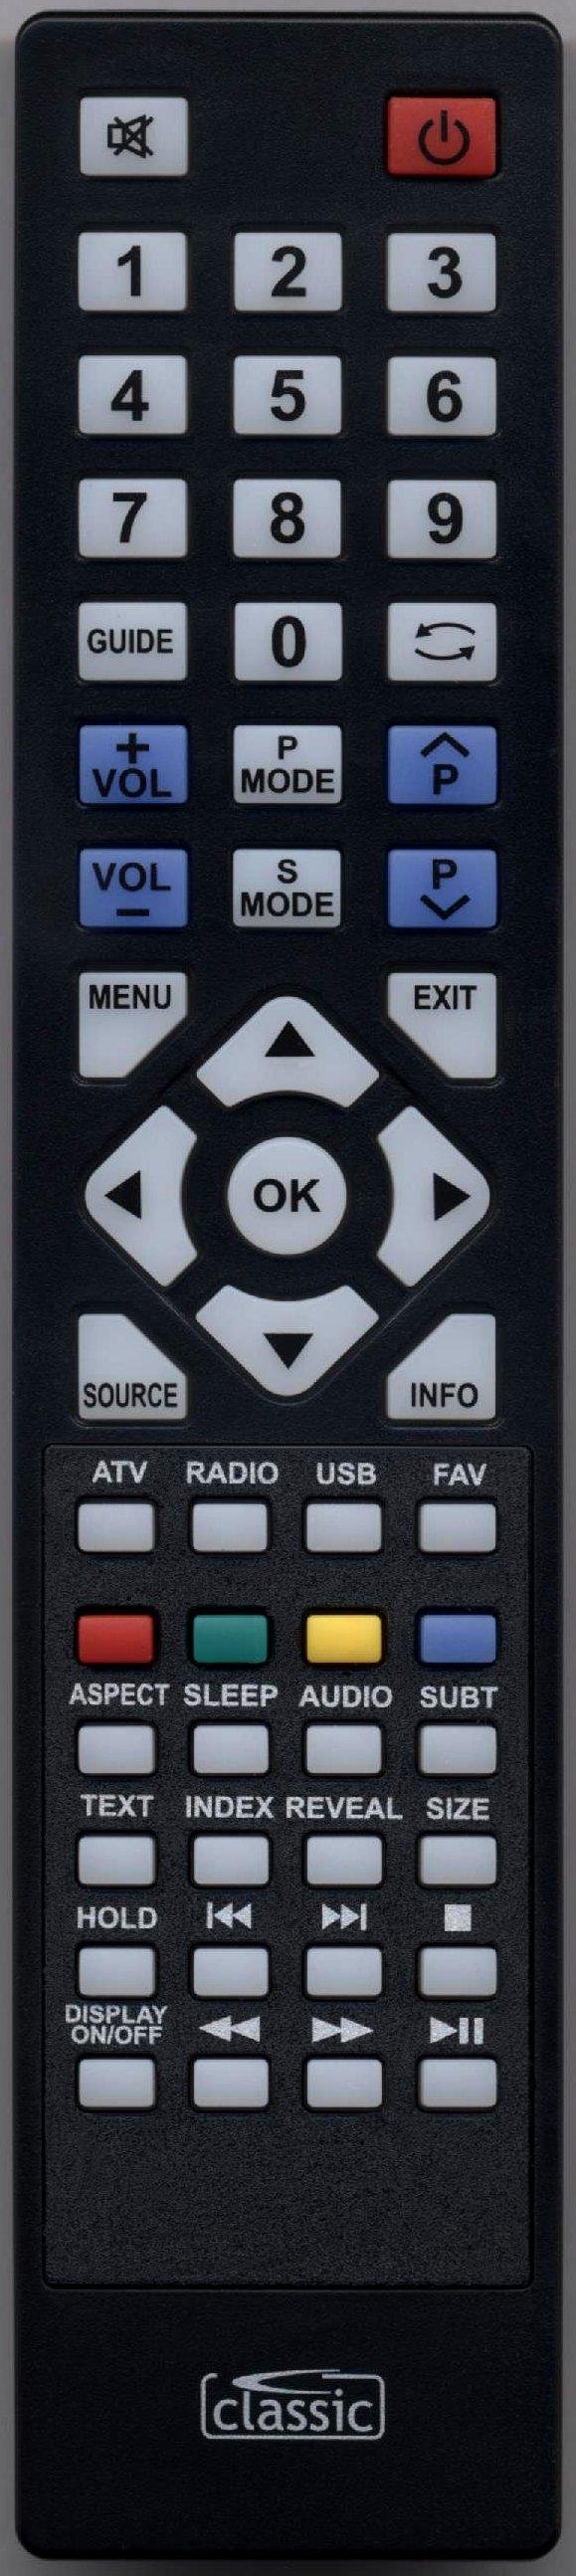 Blaupunkt 3256GGB1BF3TCUUK Remote Control